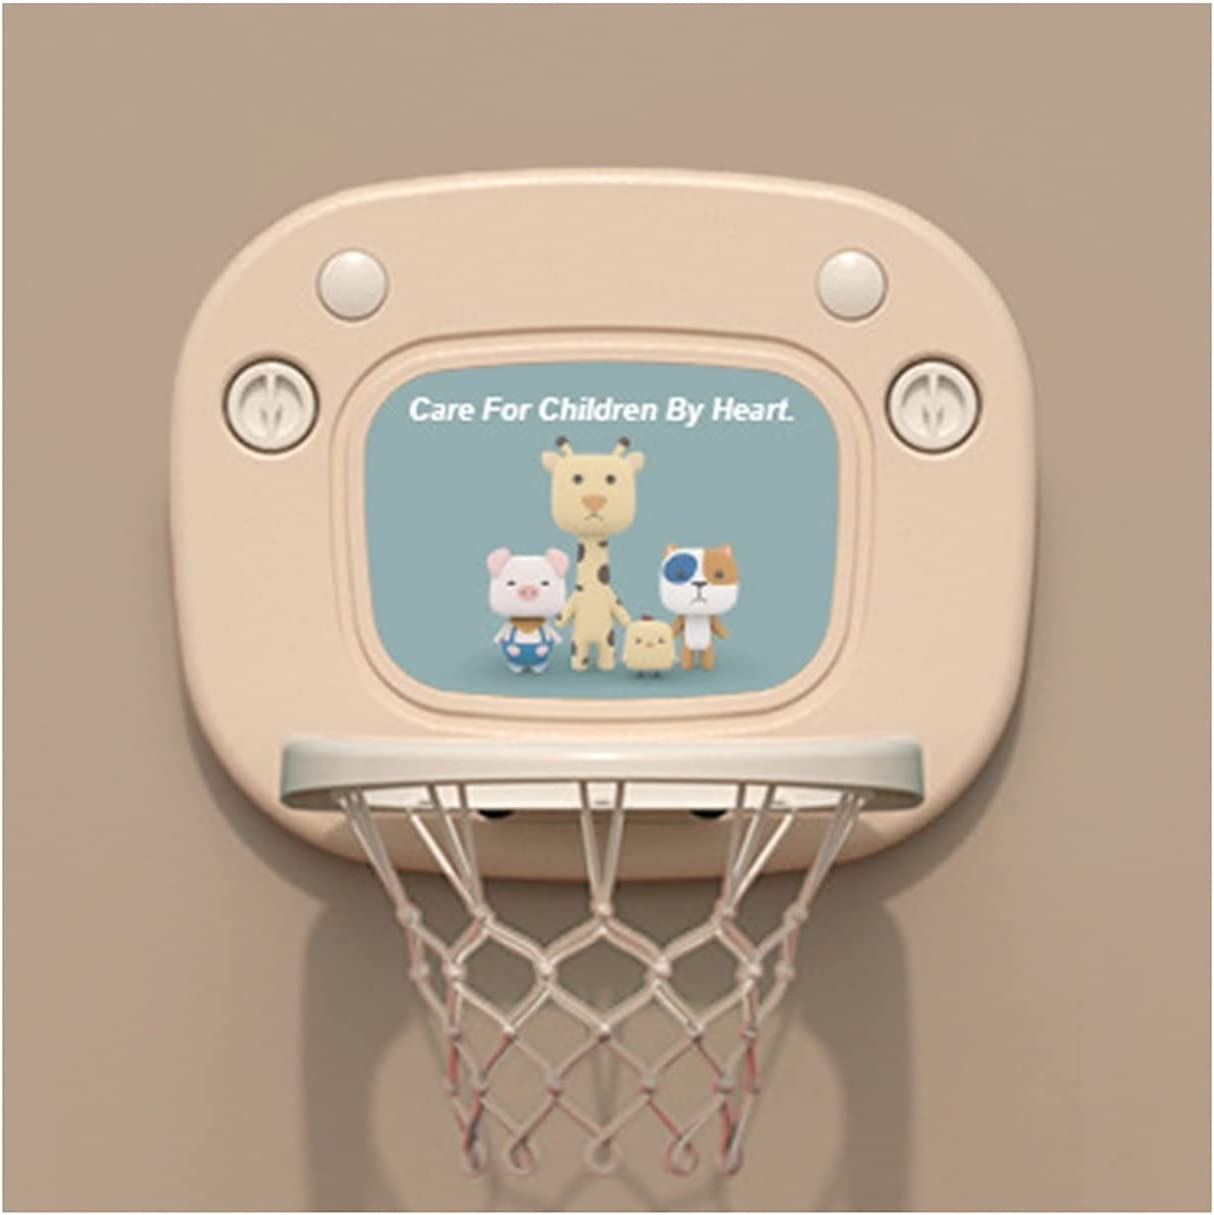 Trust Basketball Hoop Children's 1 year warranty Shooting Parent- Basket Portable Toy